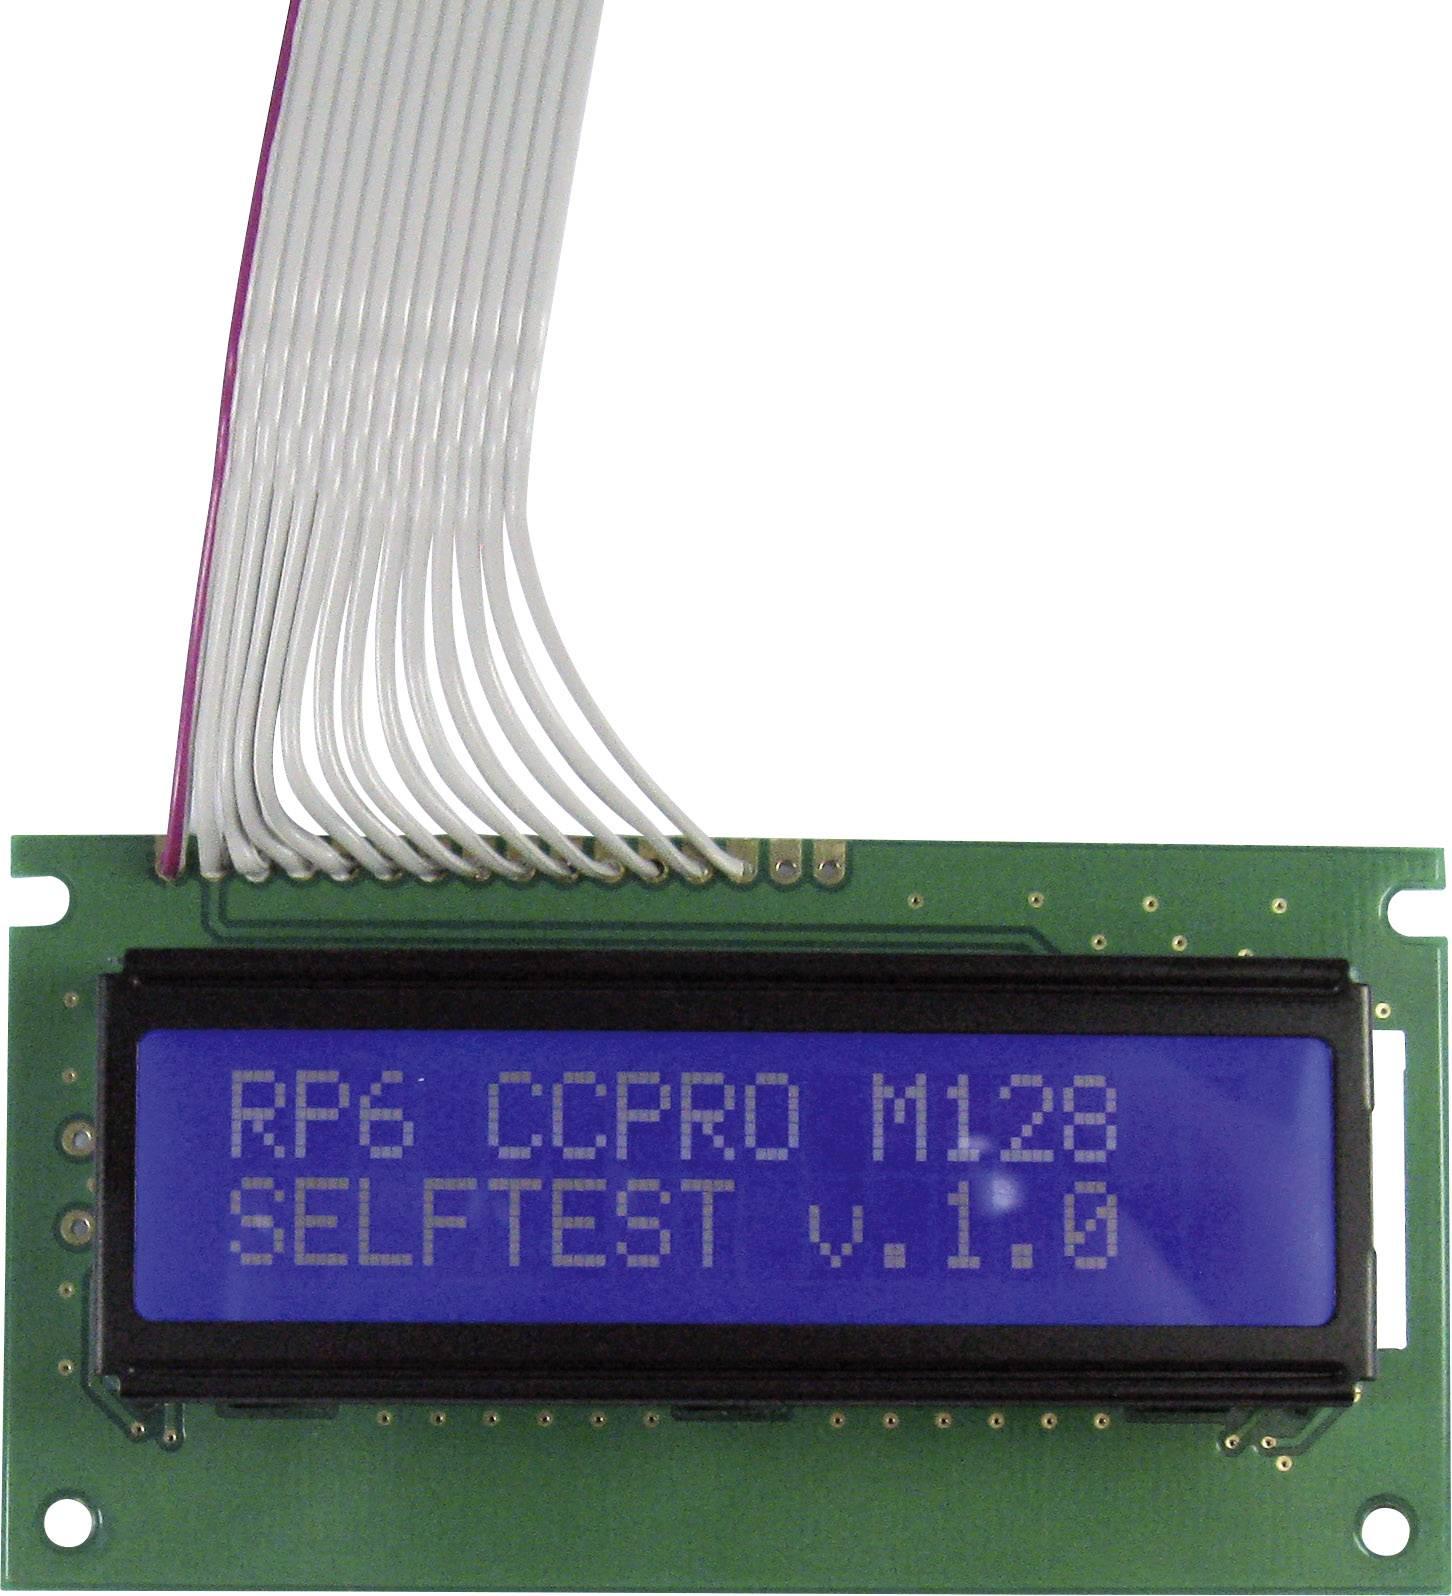 Displej pro robota C Control RP6 Arexx